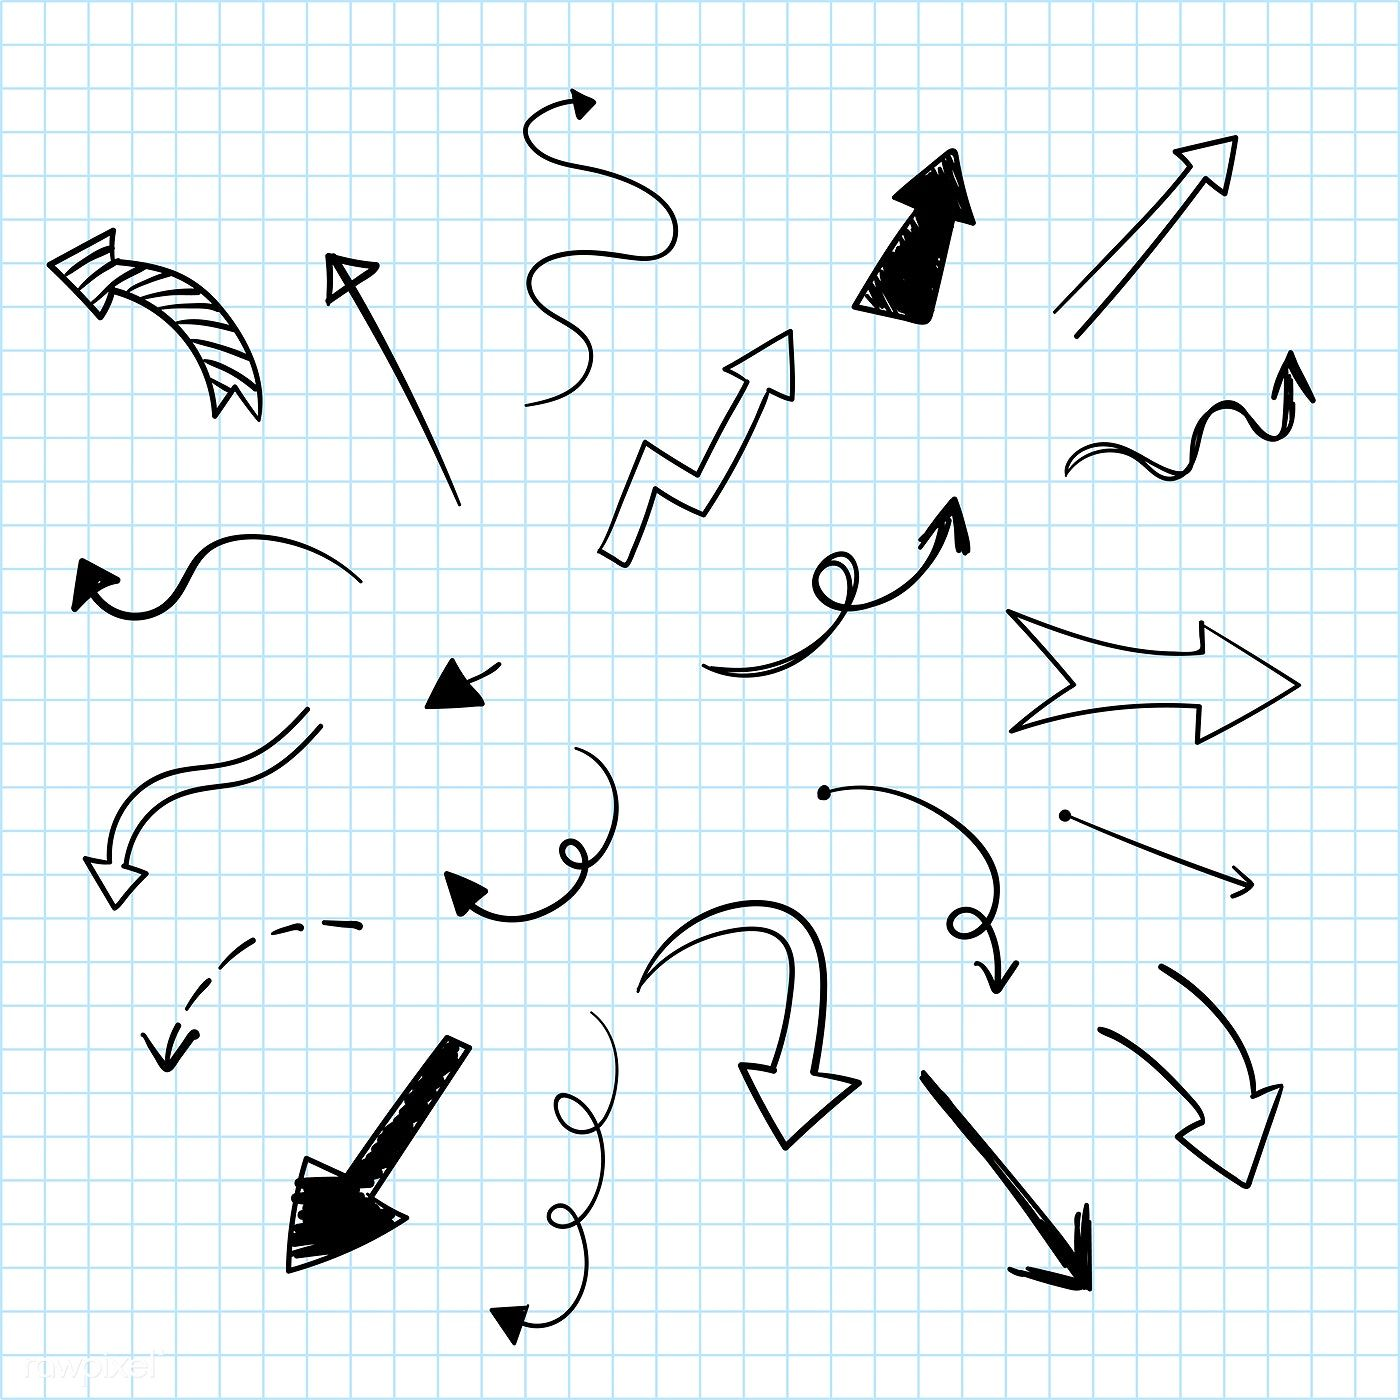 Handdrawn doodle arrows vector set free image by